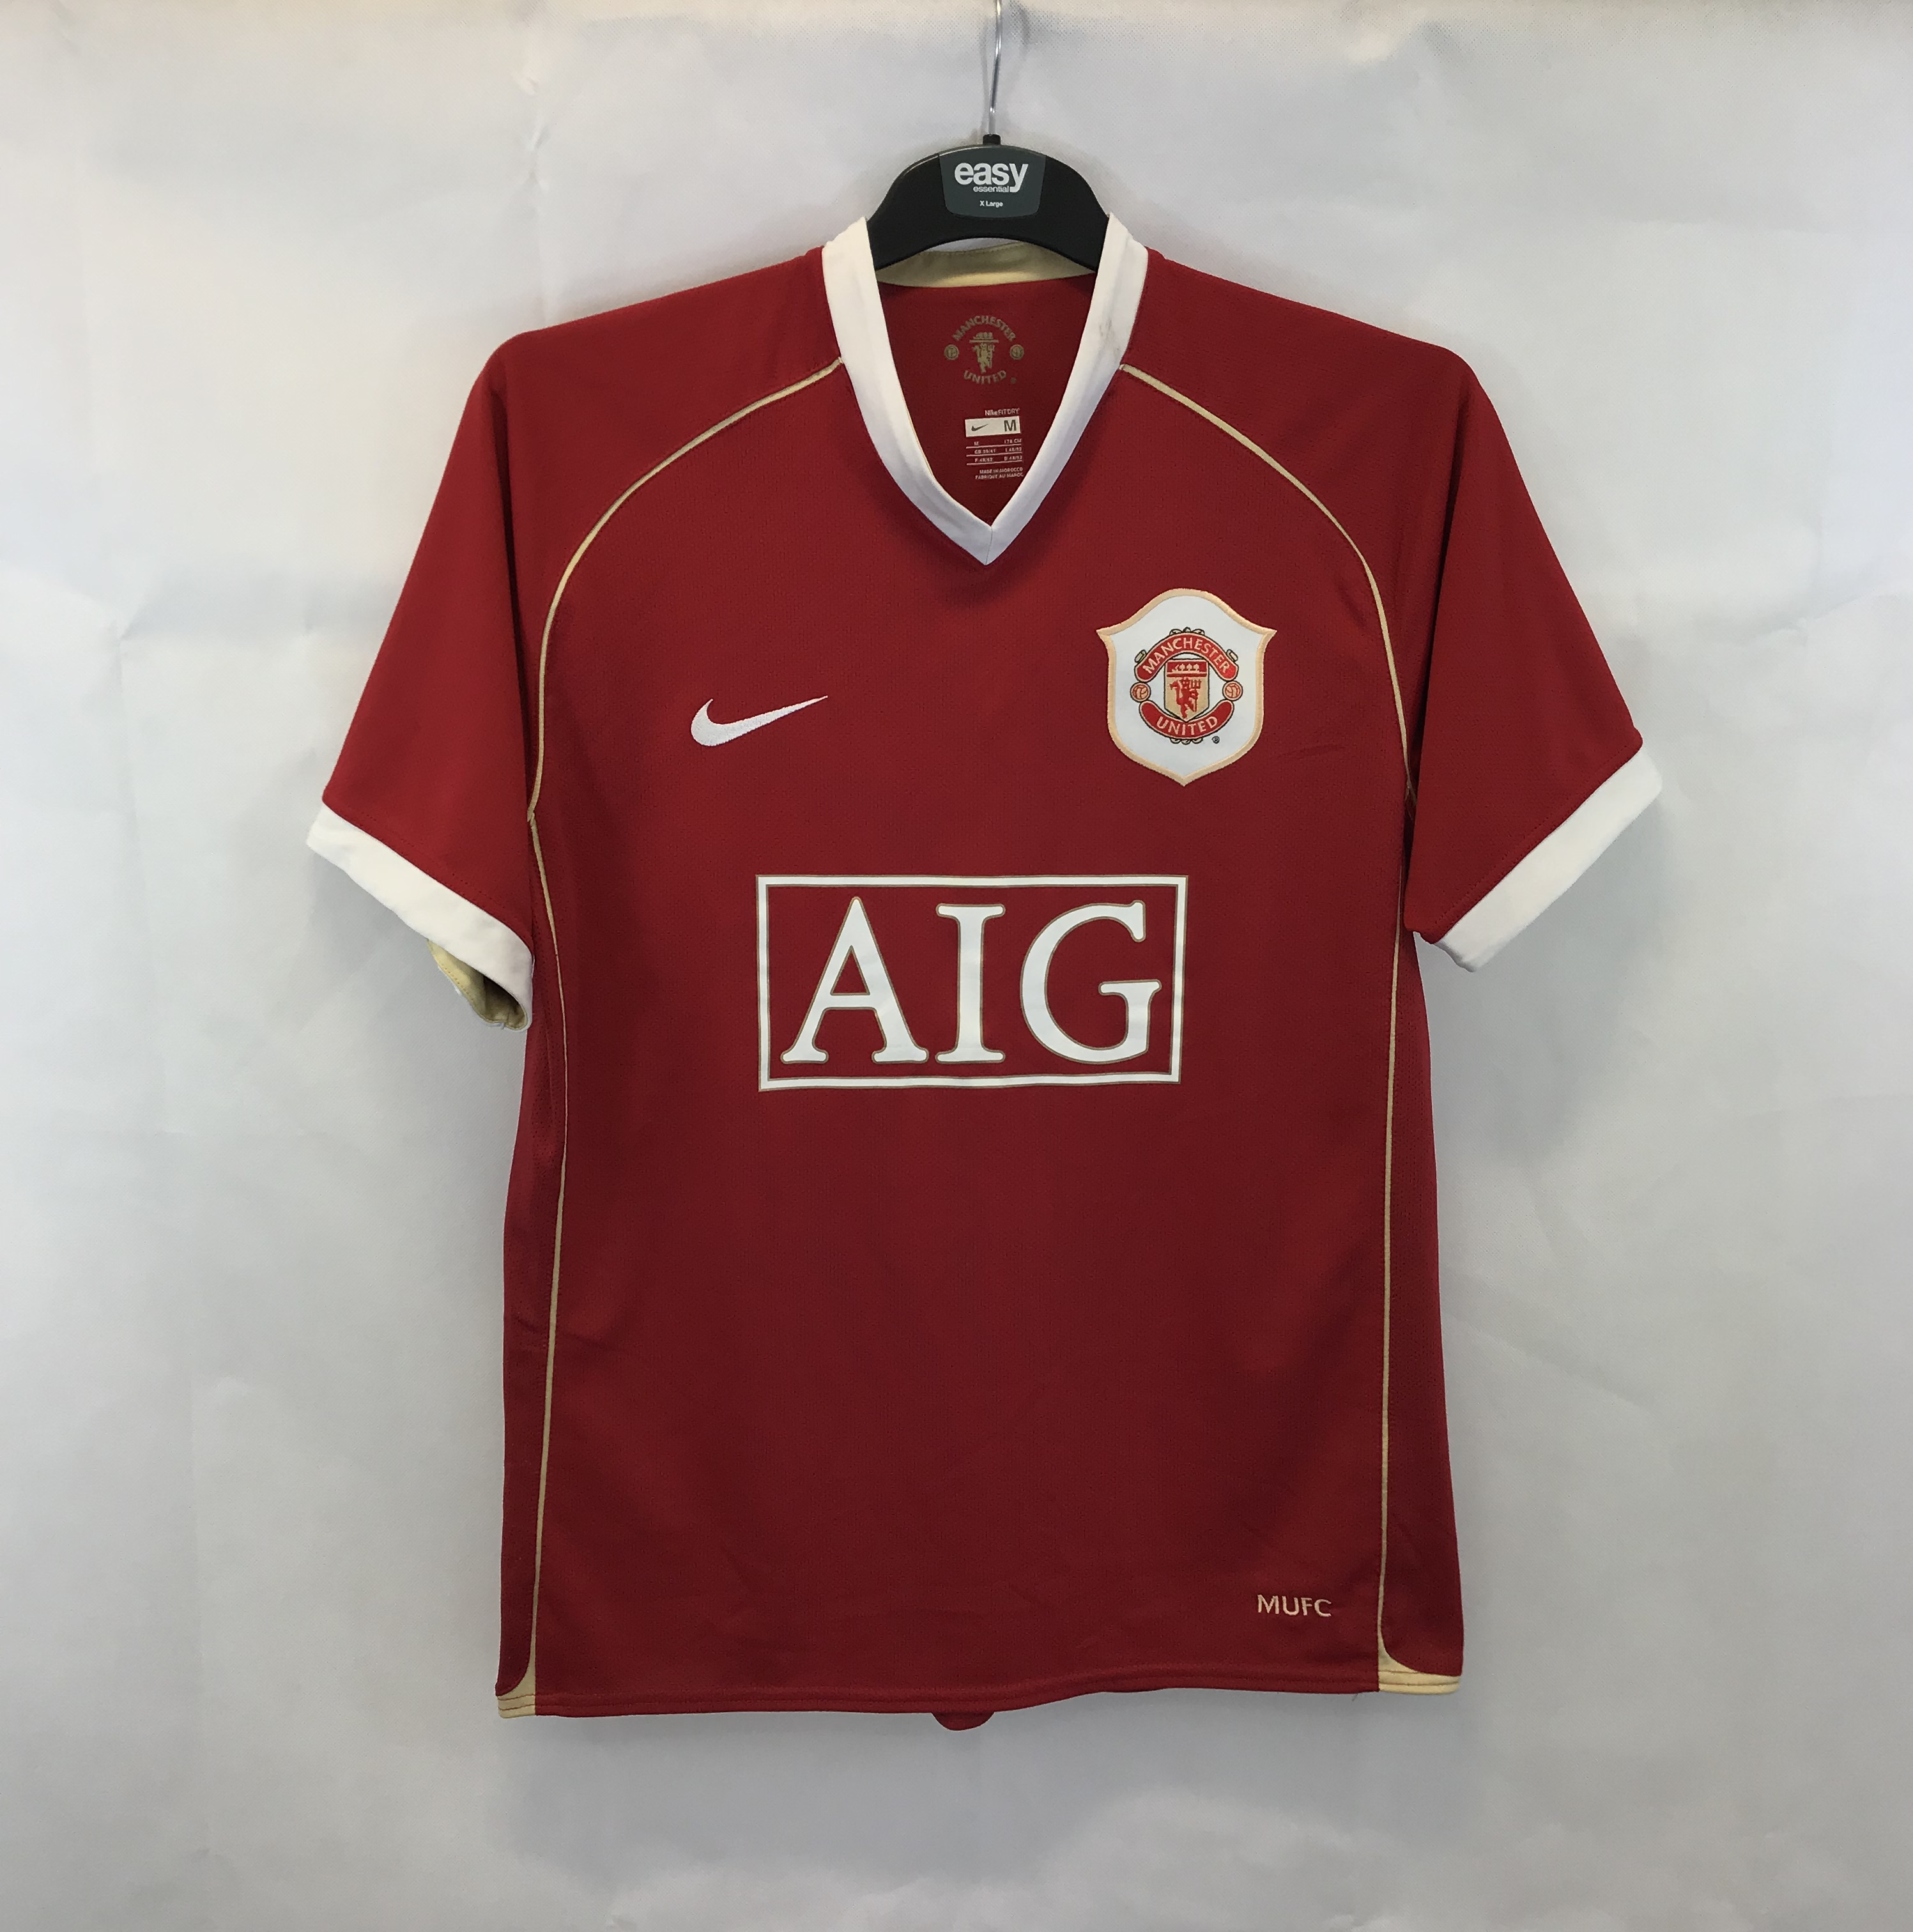 805b1511fe6 Manchester United Ronaldo 7 Home Football Shirt 2006 07 Adults Medium Nike.  🔍. instock